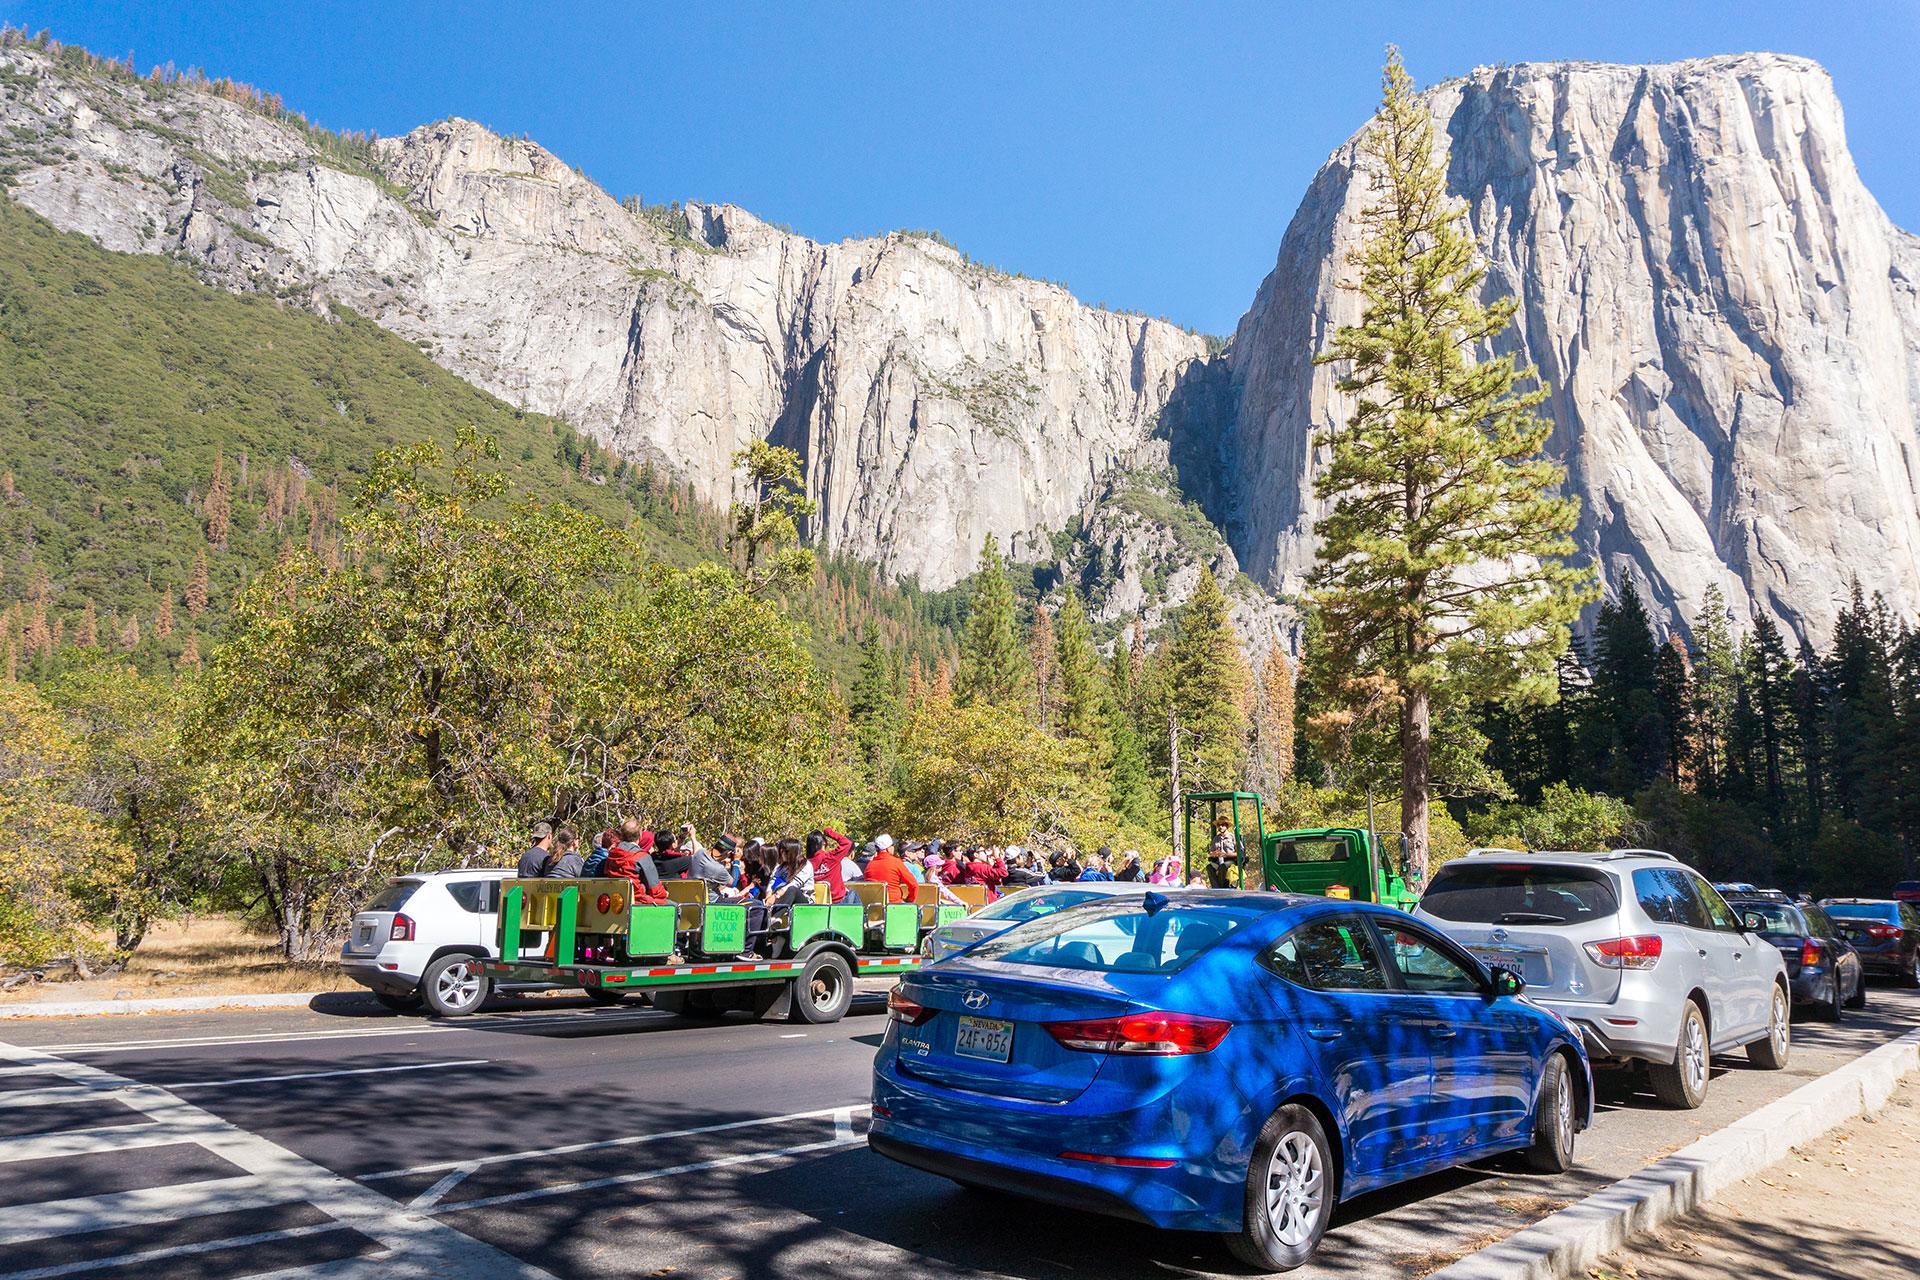 Yosemite National Park Crowds